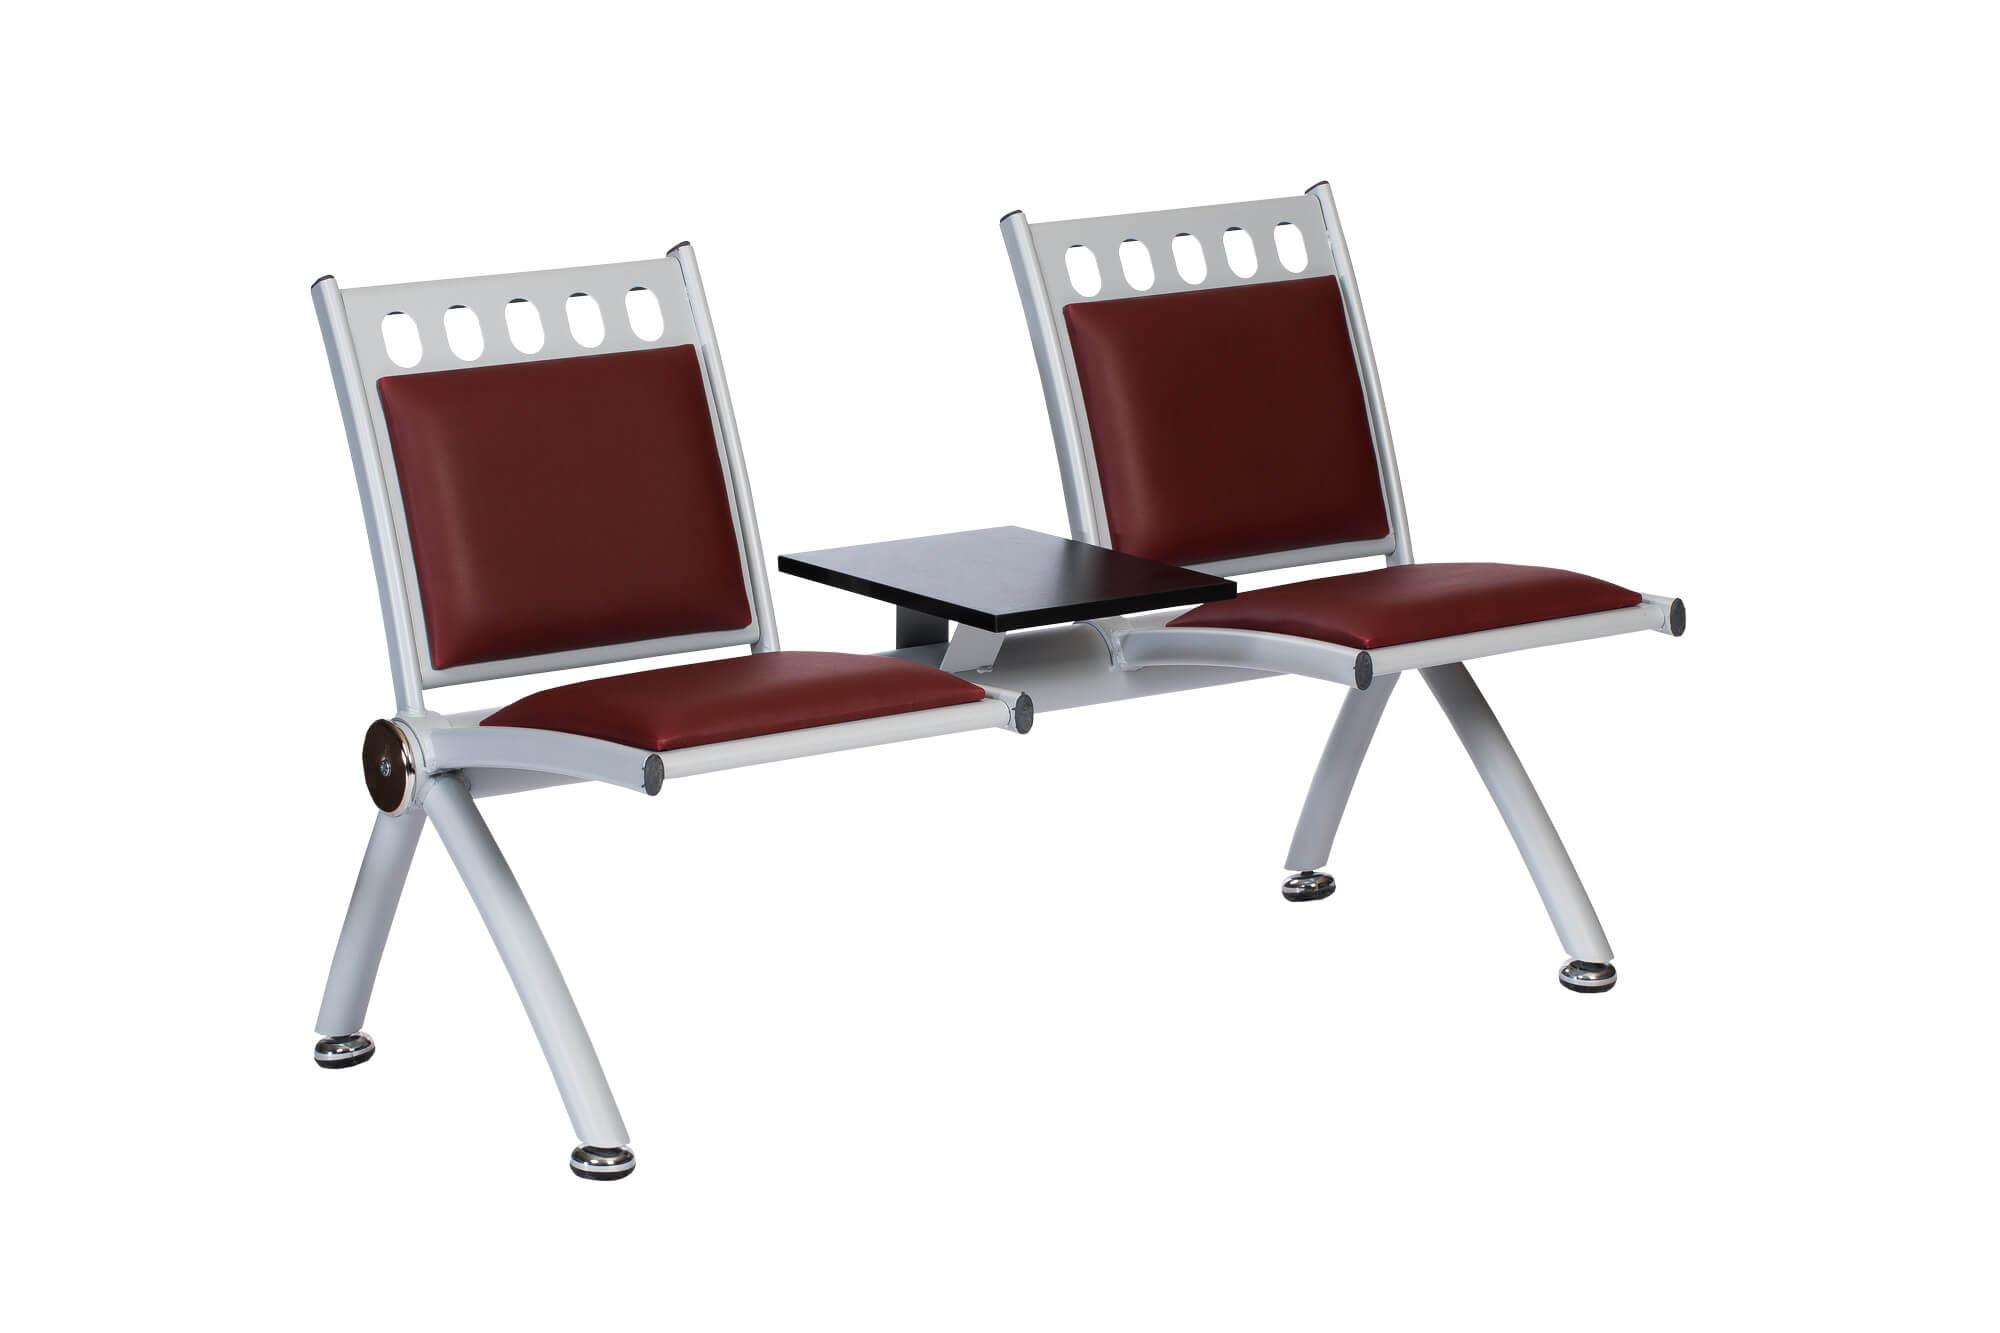 ankara,bekleme koltuğu,ikili bekleme,orta sehpalı bekleme koltuğu,ekonomik bekleme koltuğu,ucuz bekleme koltuğu,form bekleme koltuğu